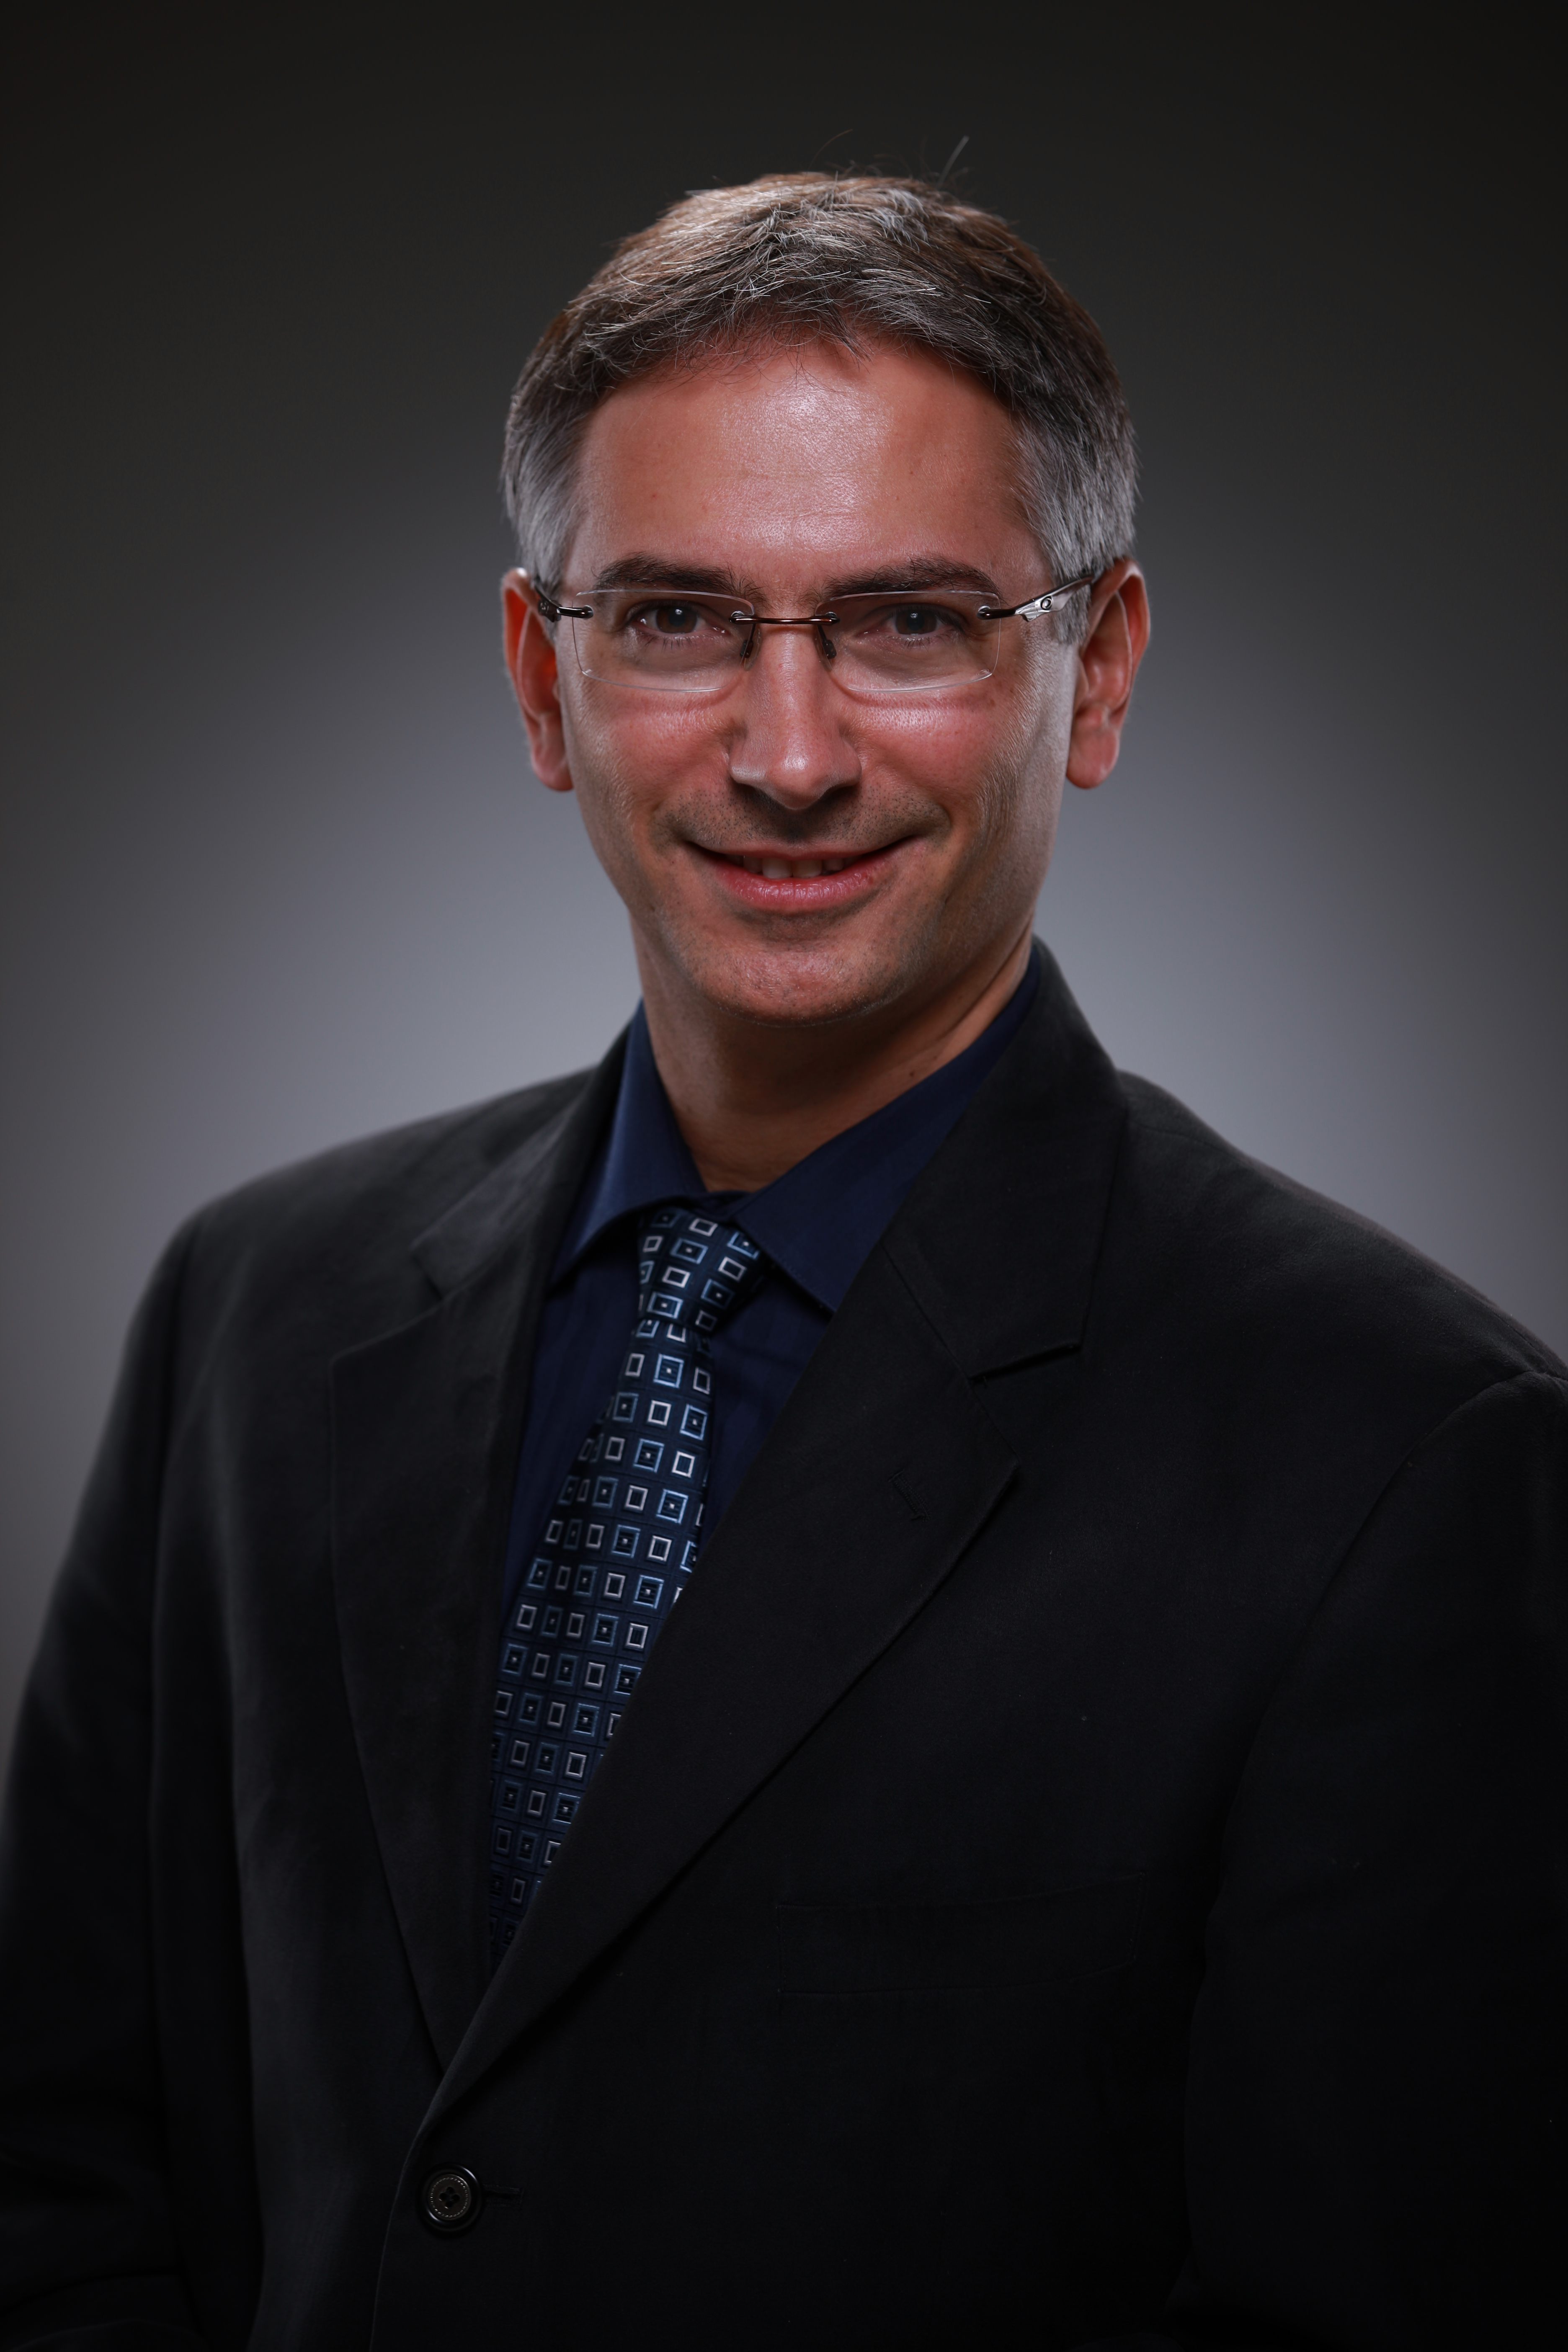 Daniel Ziv's headshot